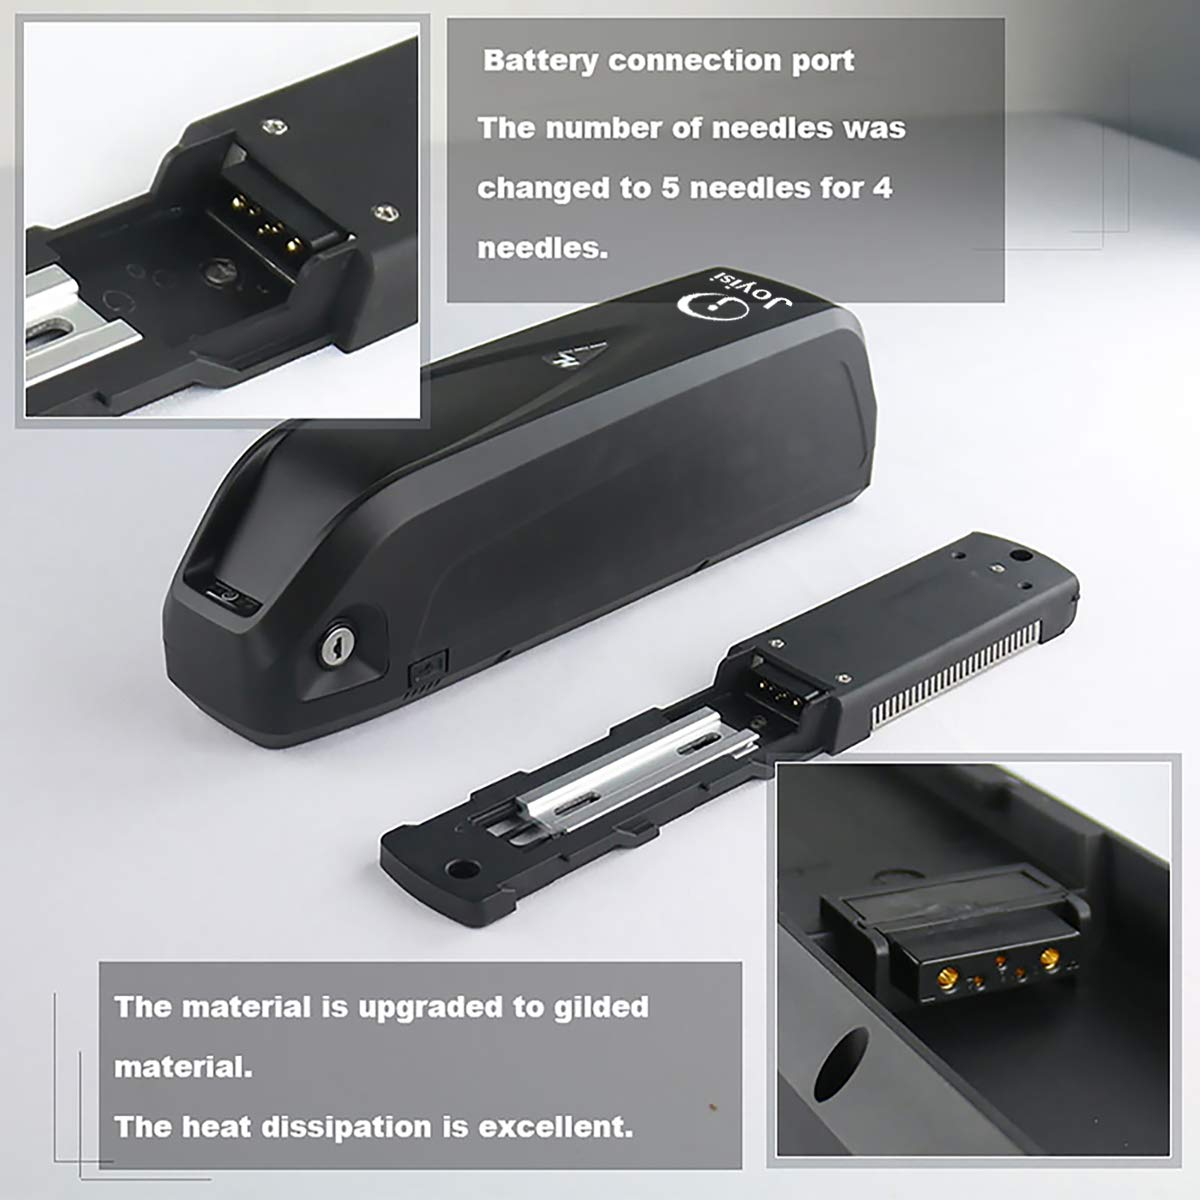 Electric Bike Battery for 1000W // 500W Bike Motor USB Port Joyisi Ebike Battery 48V 13AH // 36V 15AH Lithium ion Battery with Charger Black